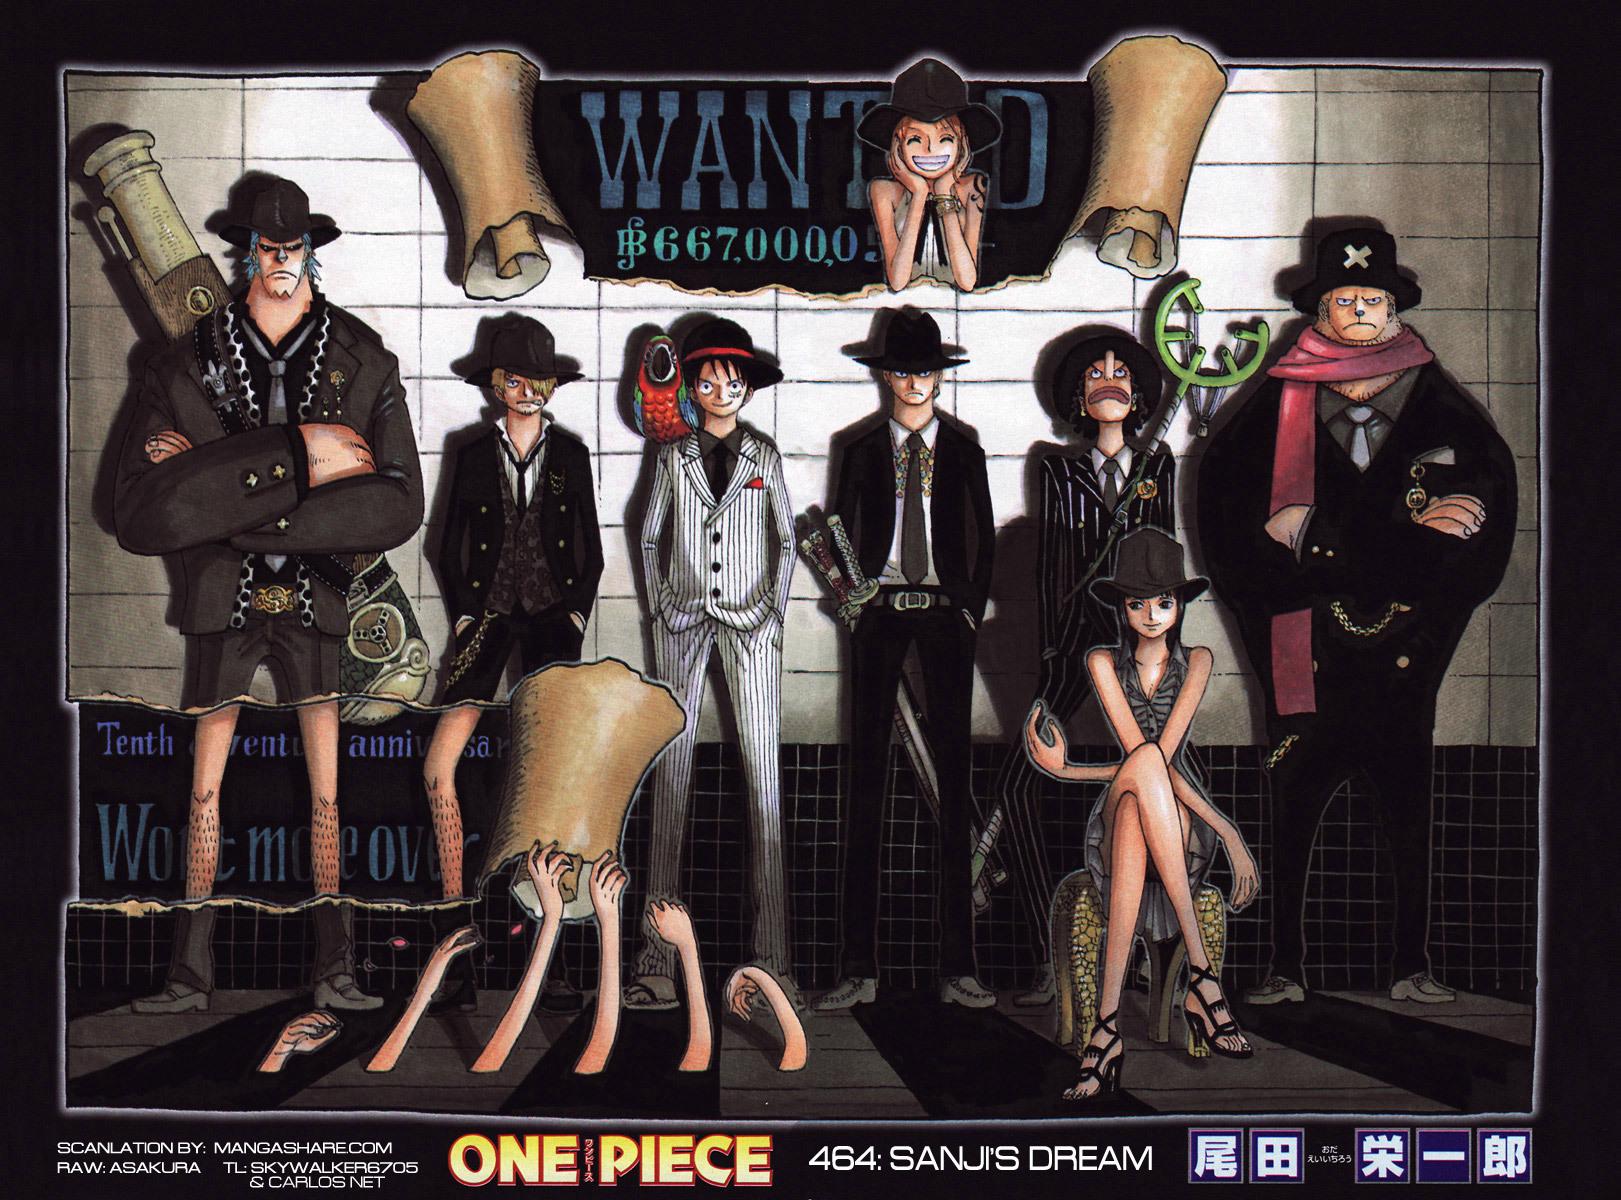 One Piece images Straw Hat Crew Bounty wallpaper photos 9751095 1621x1200